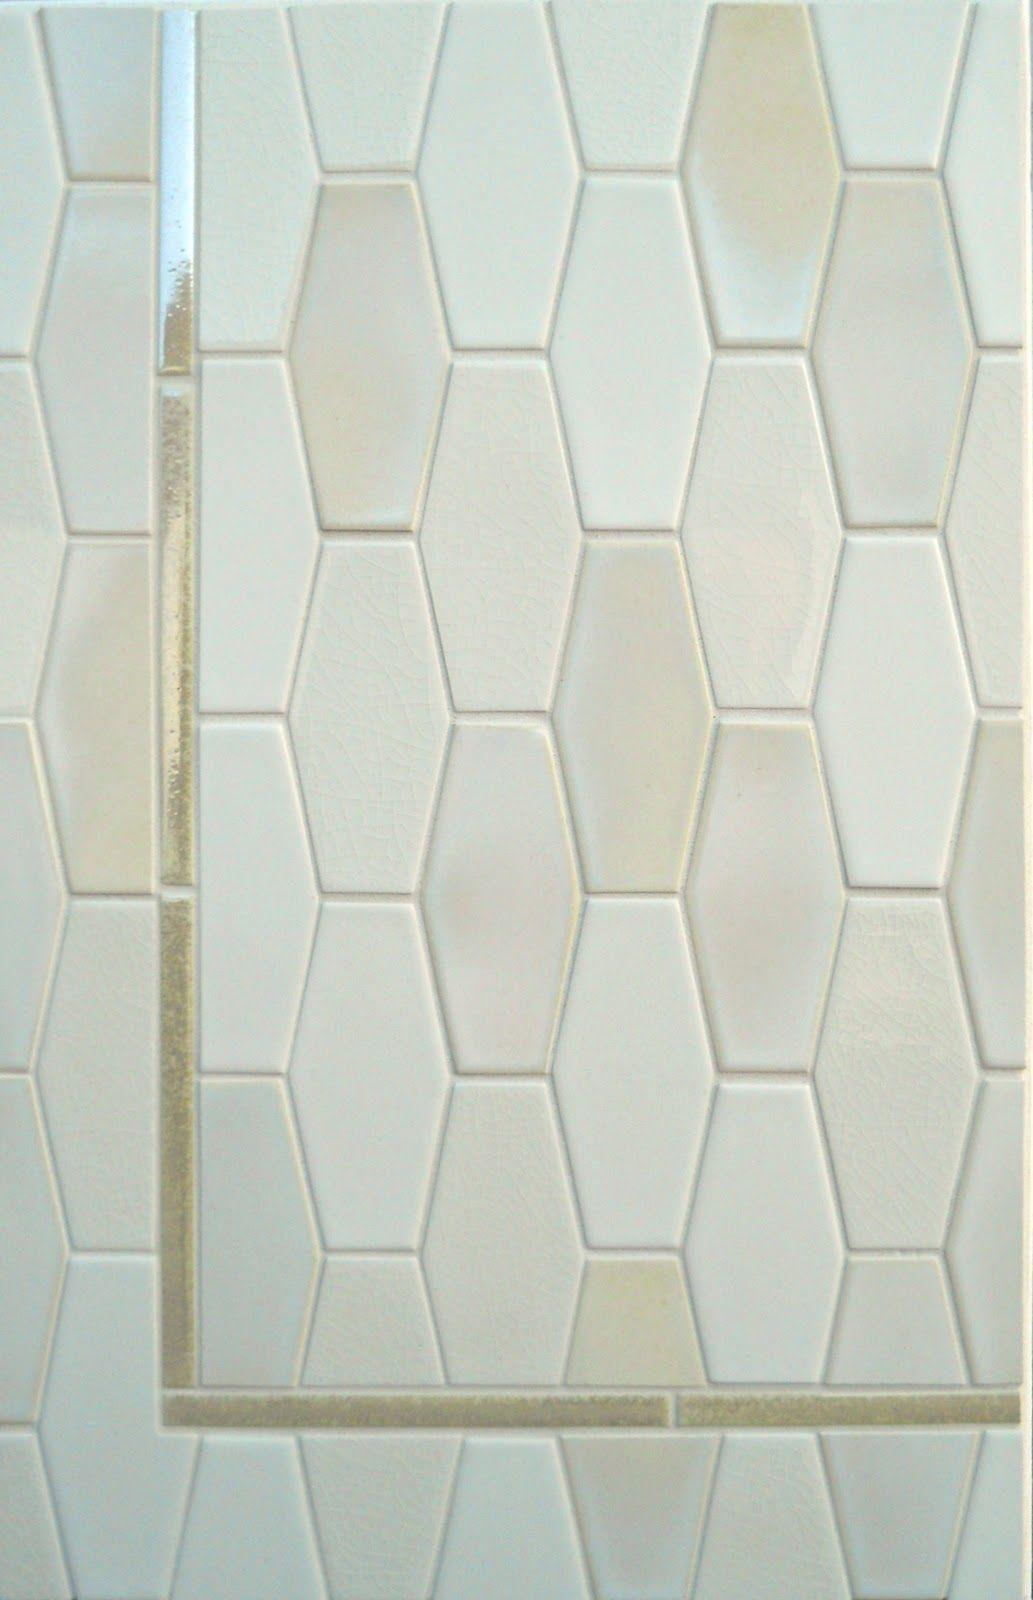 Elongated Hexagon Tile Backsplash Google Search Hexagon